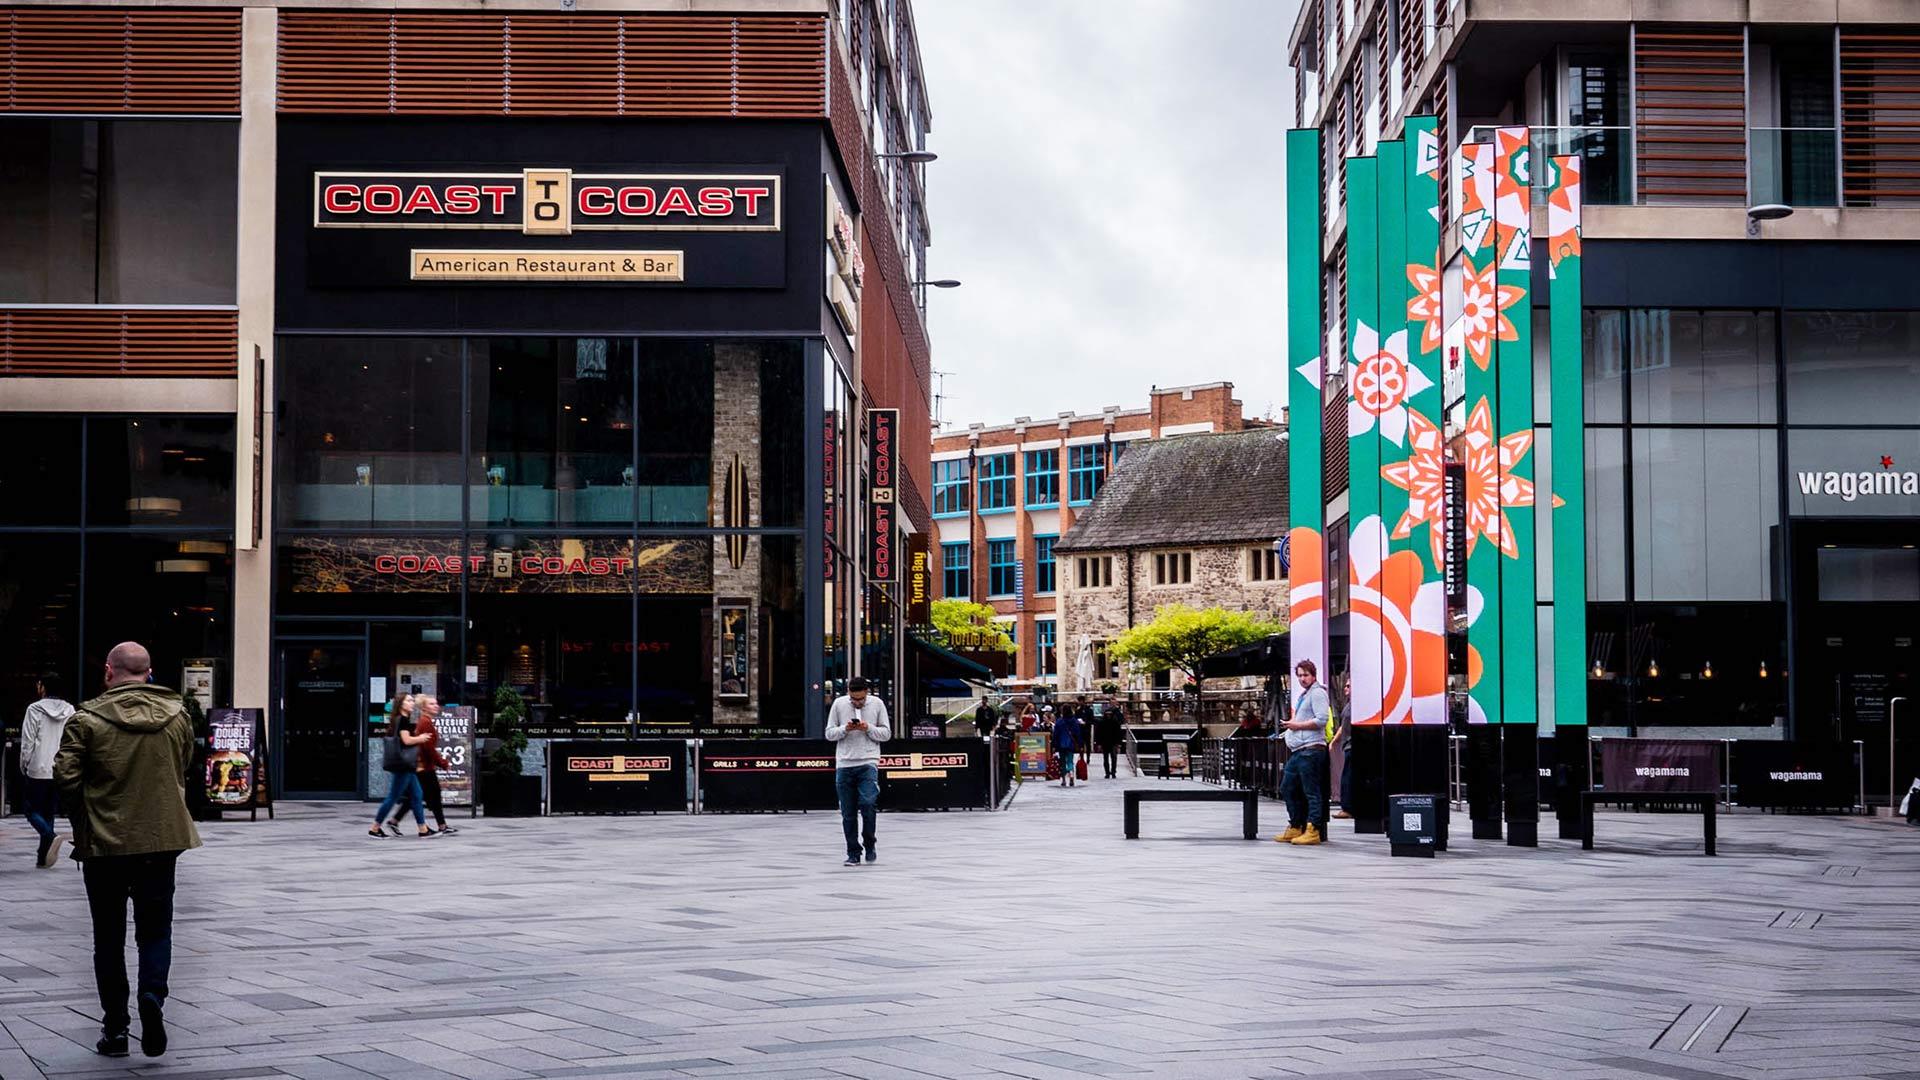 Beacons Highcross LED Art Installation in City Centre